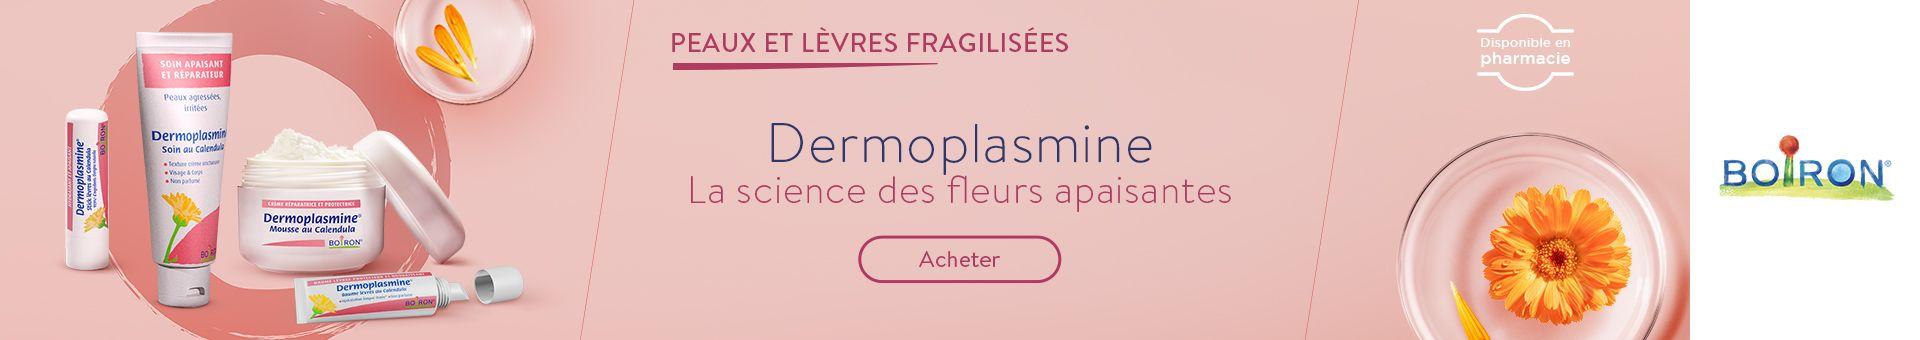 Pharmacie Saint-Jean,SAINT-JEAN-DE-LIVERSAY